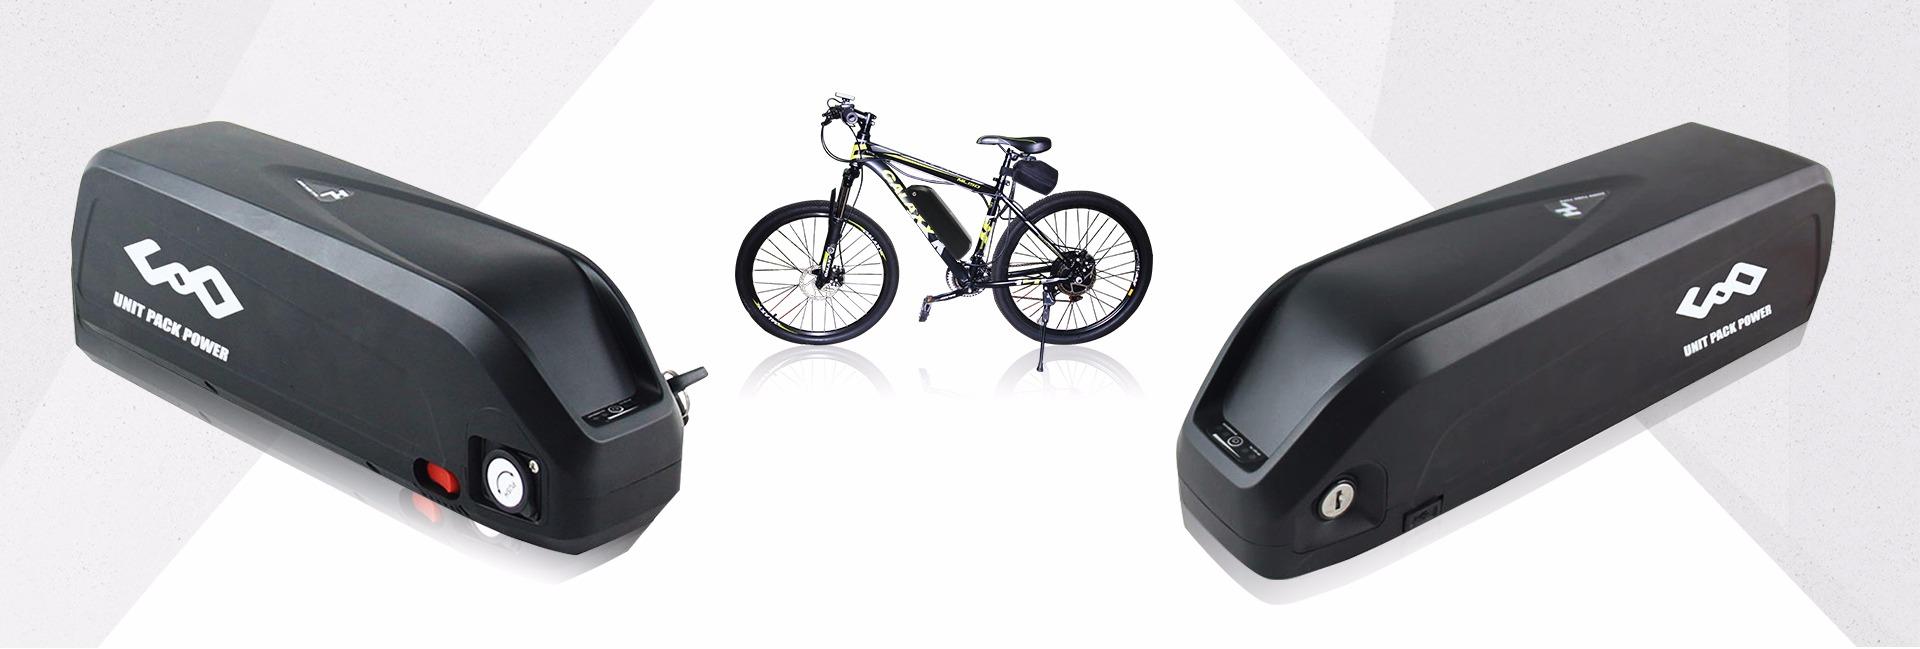 Li-ion Battery 48V 14AH Volt Rechargeable Bicycle 1000W E-Bike Electric Li-ion